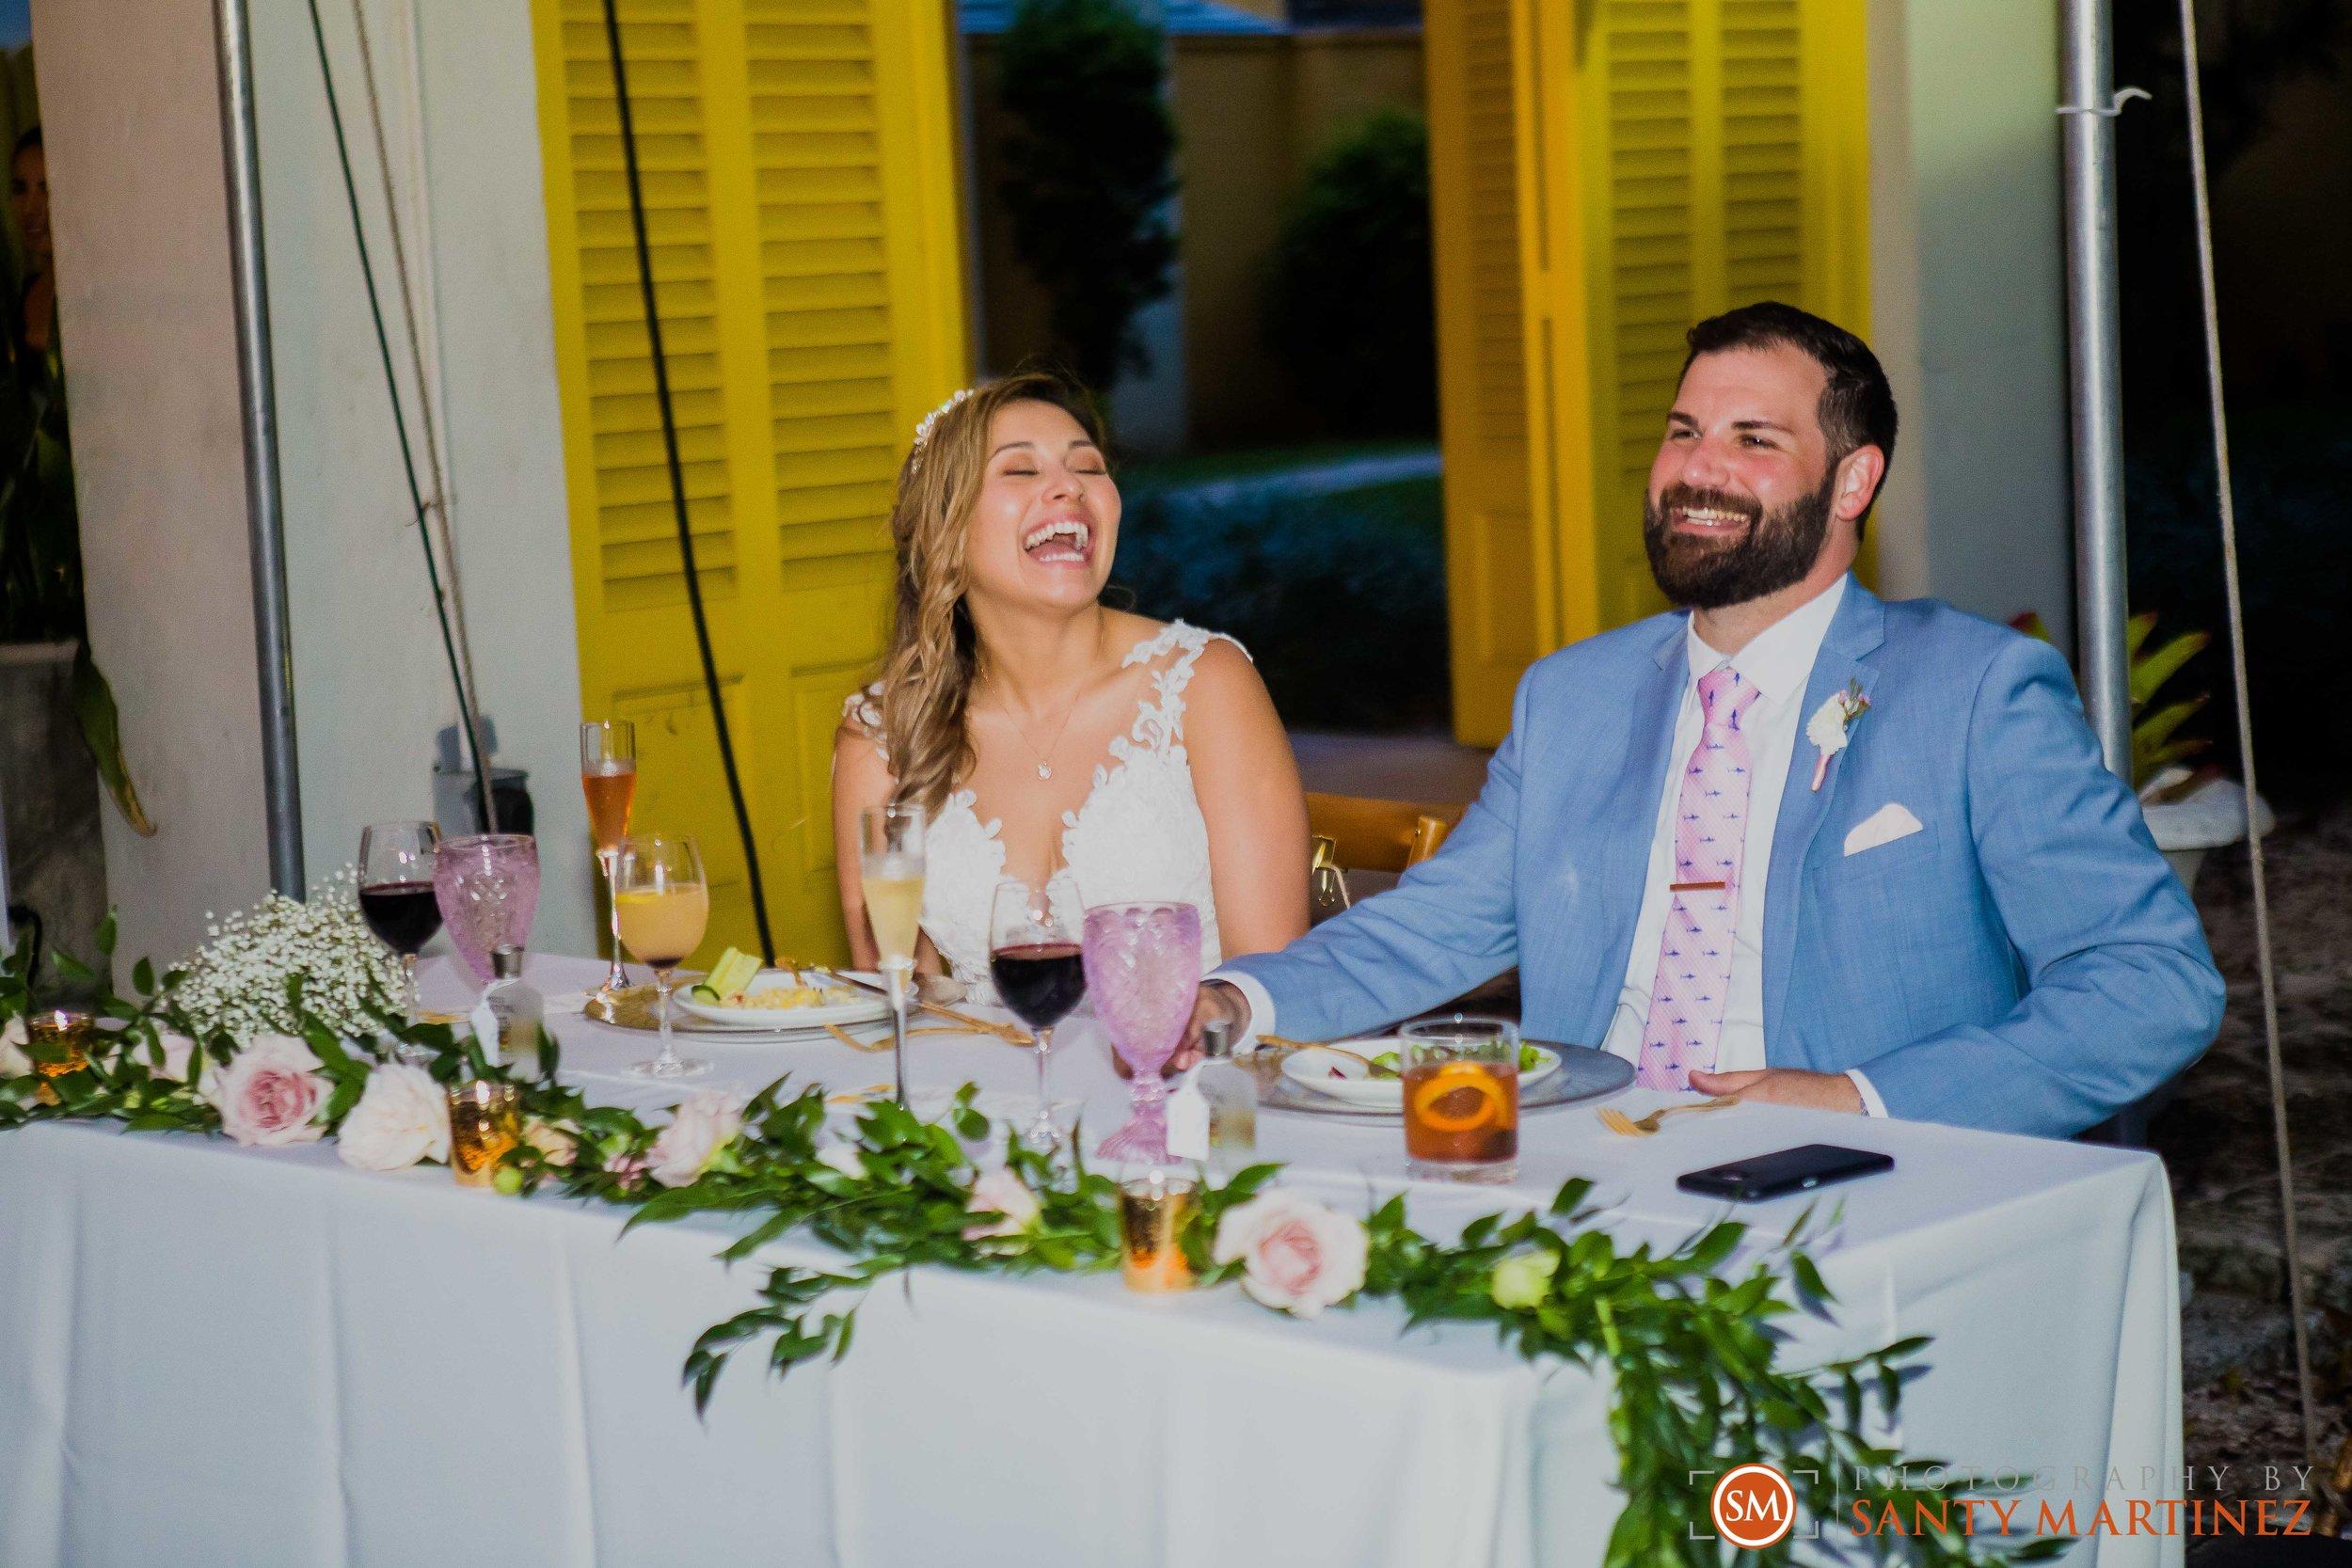 Wedding Bonnet House - Santy Martinez Photography-62.jpg